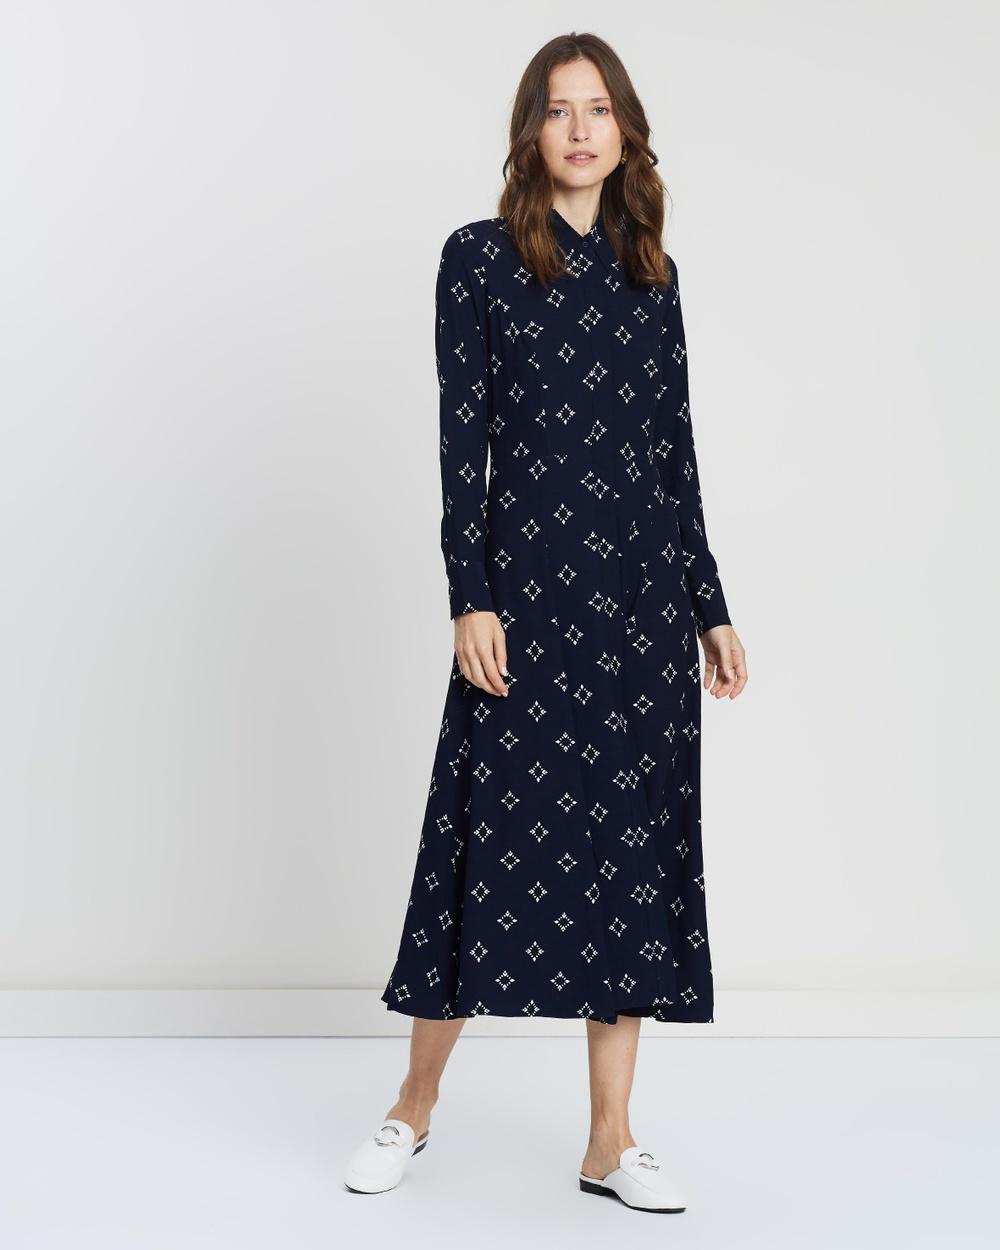 Ivy & Oak AOP Print Raute & Navy Blue Pointed Collar Dress